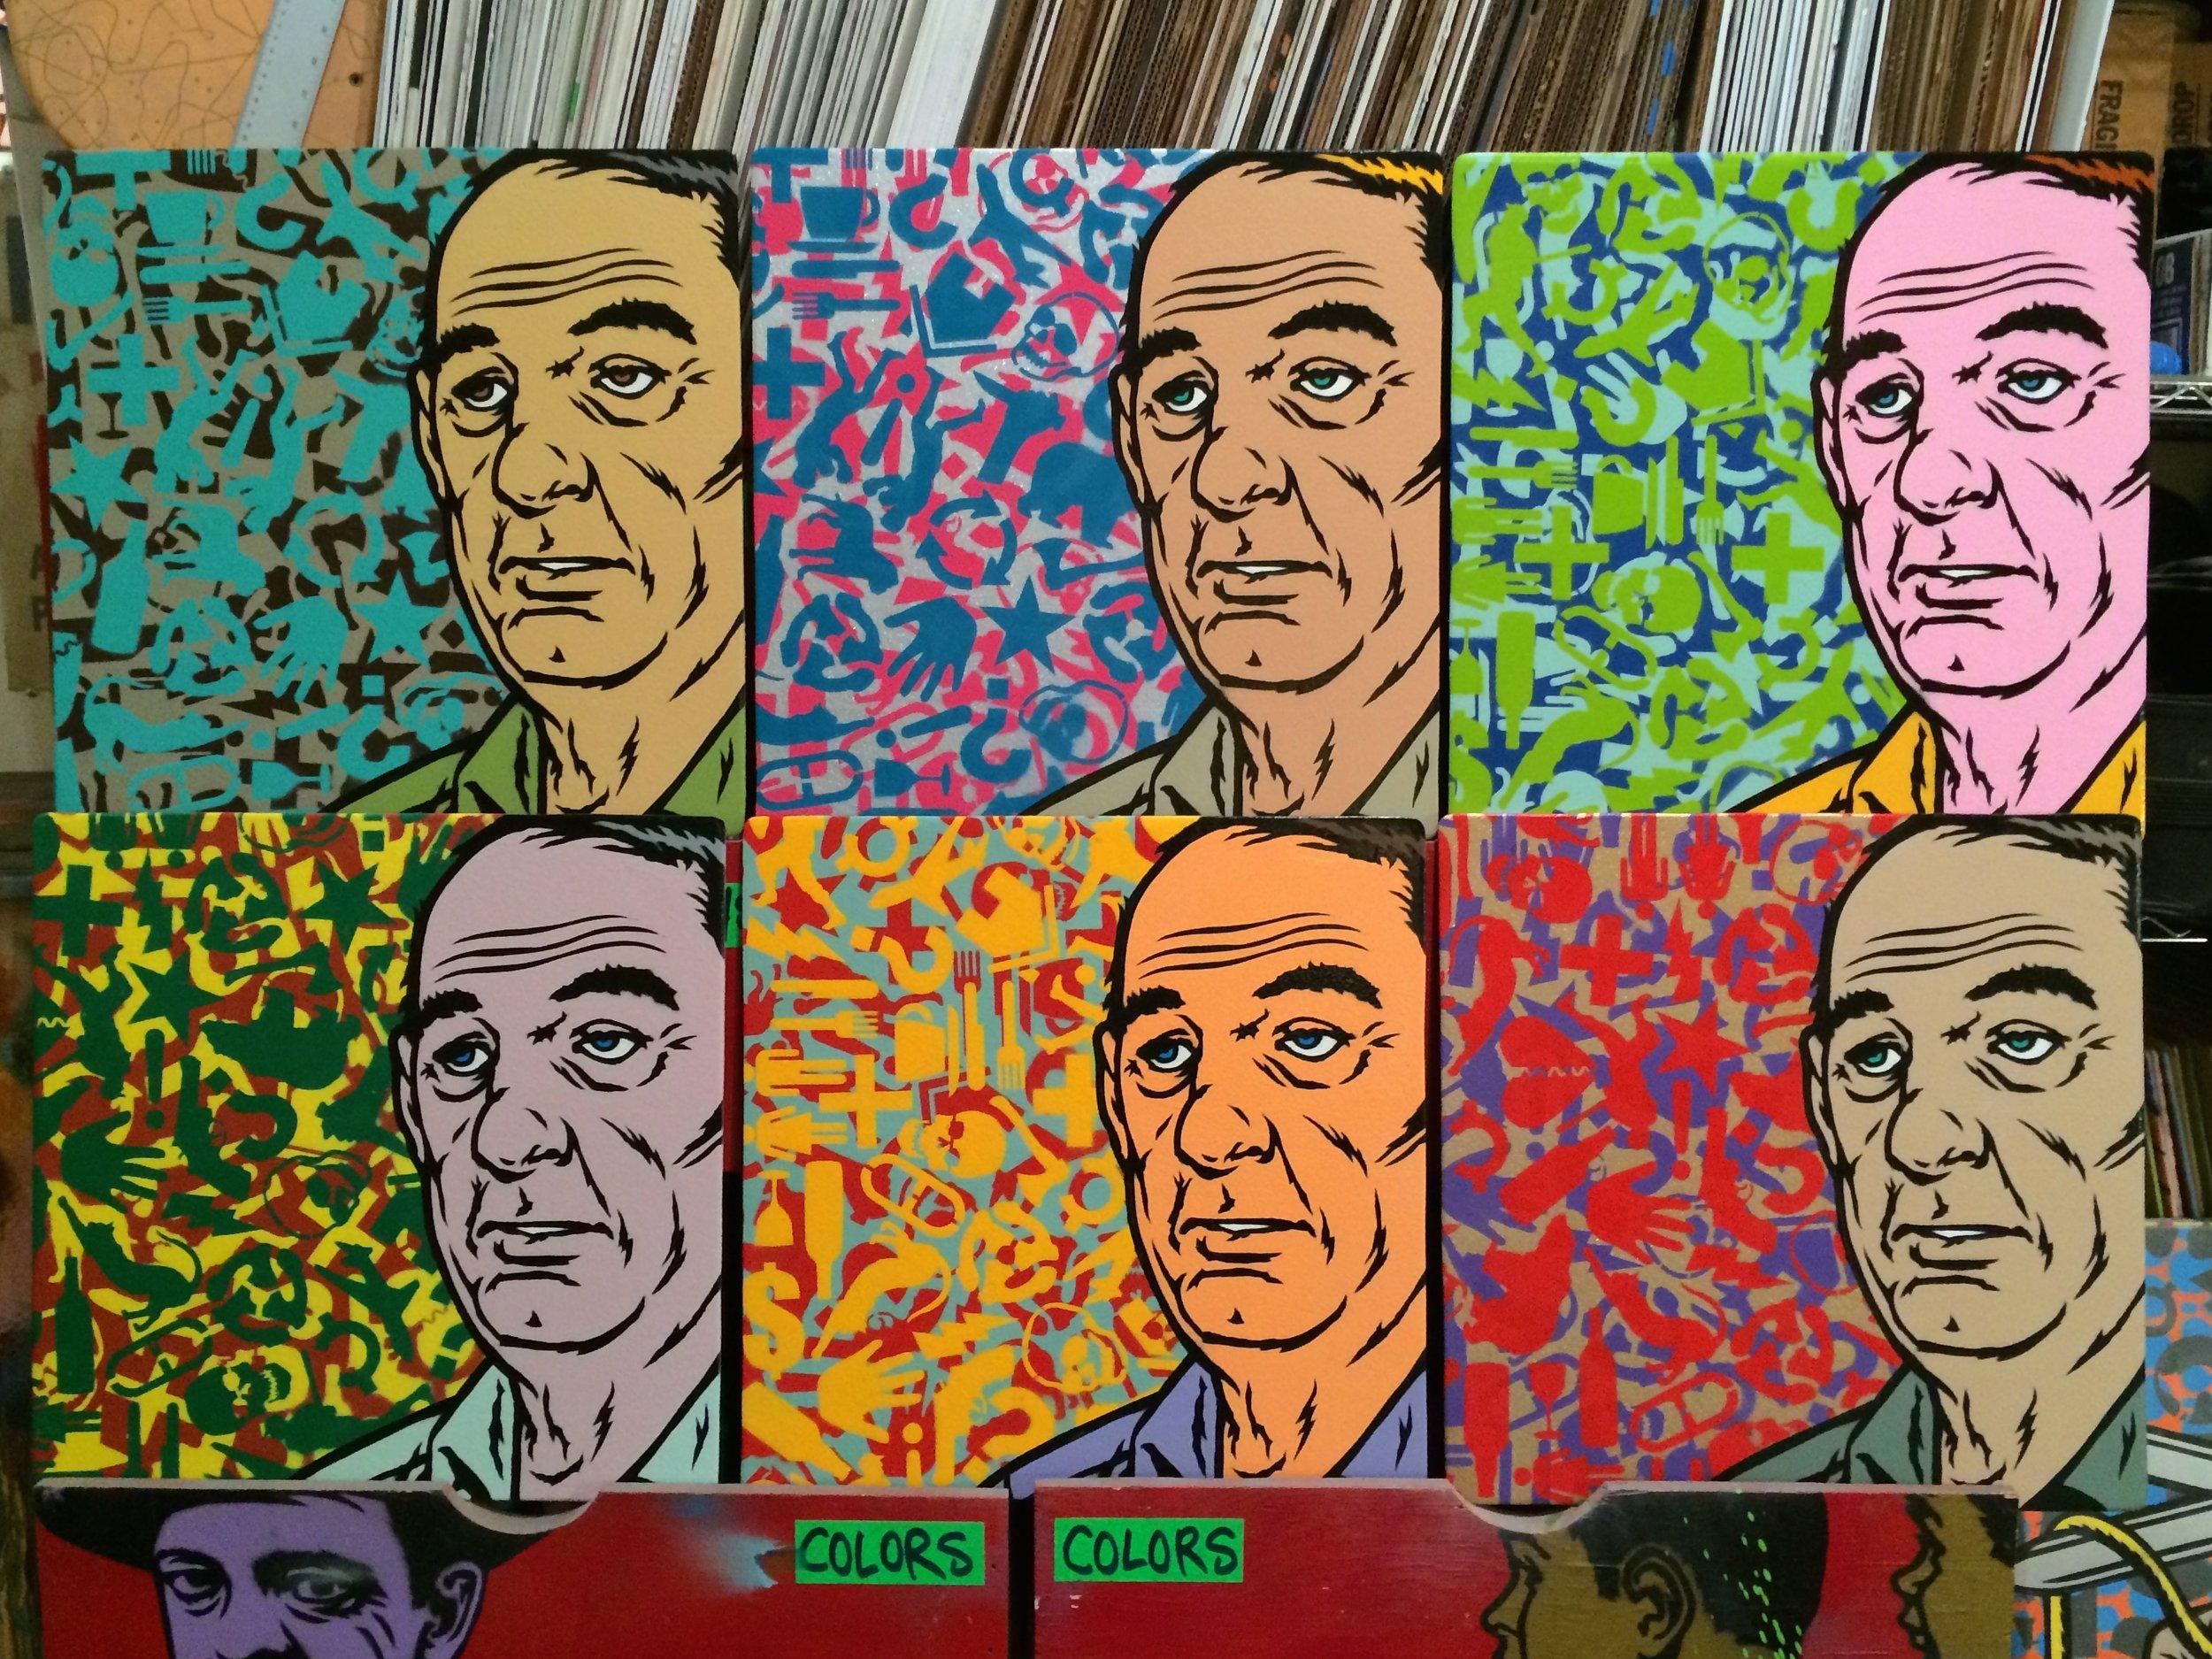 """Joe 6 Pack"" Spray paint/stencil on wood panel, 20""x20"" Edition of 6"